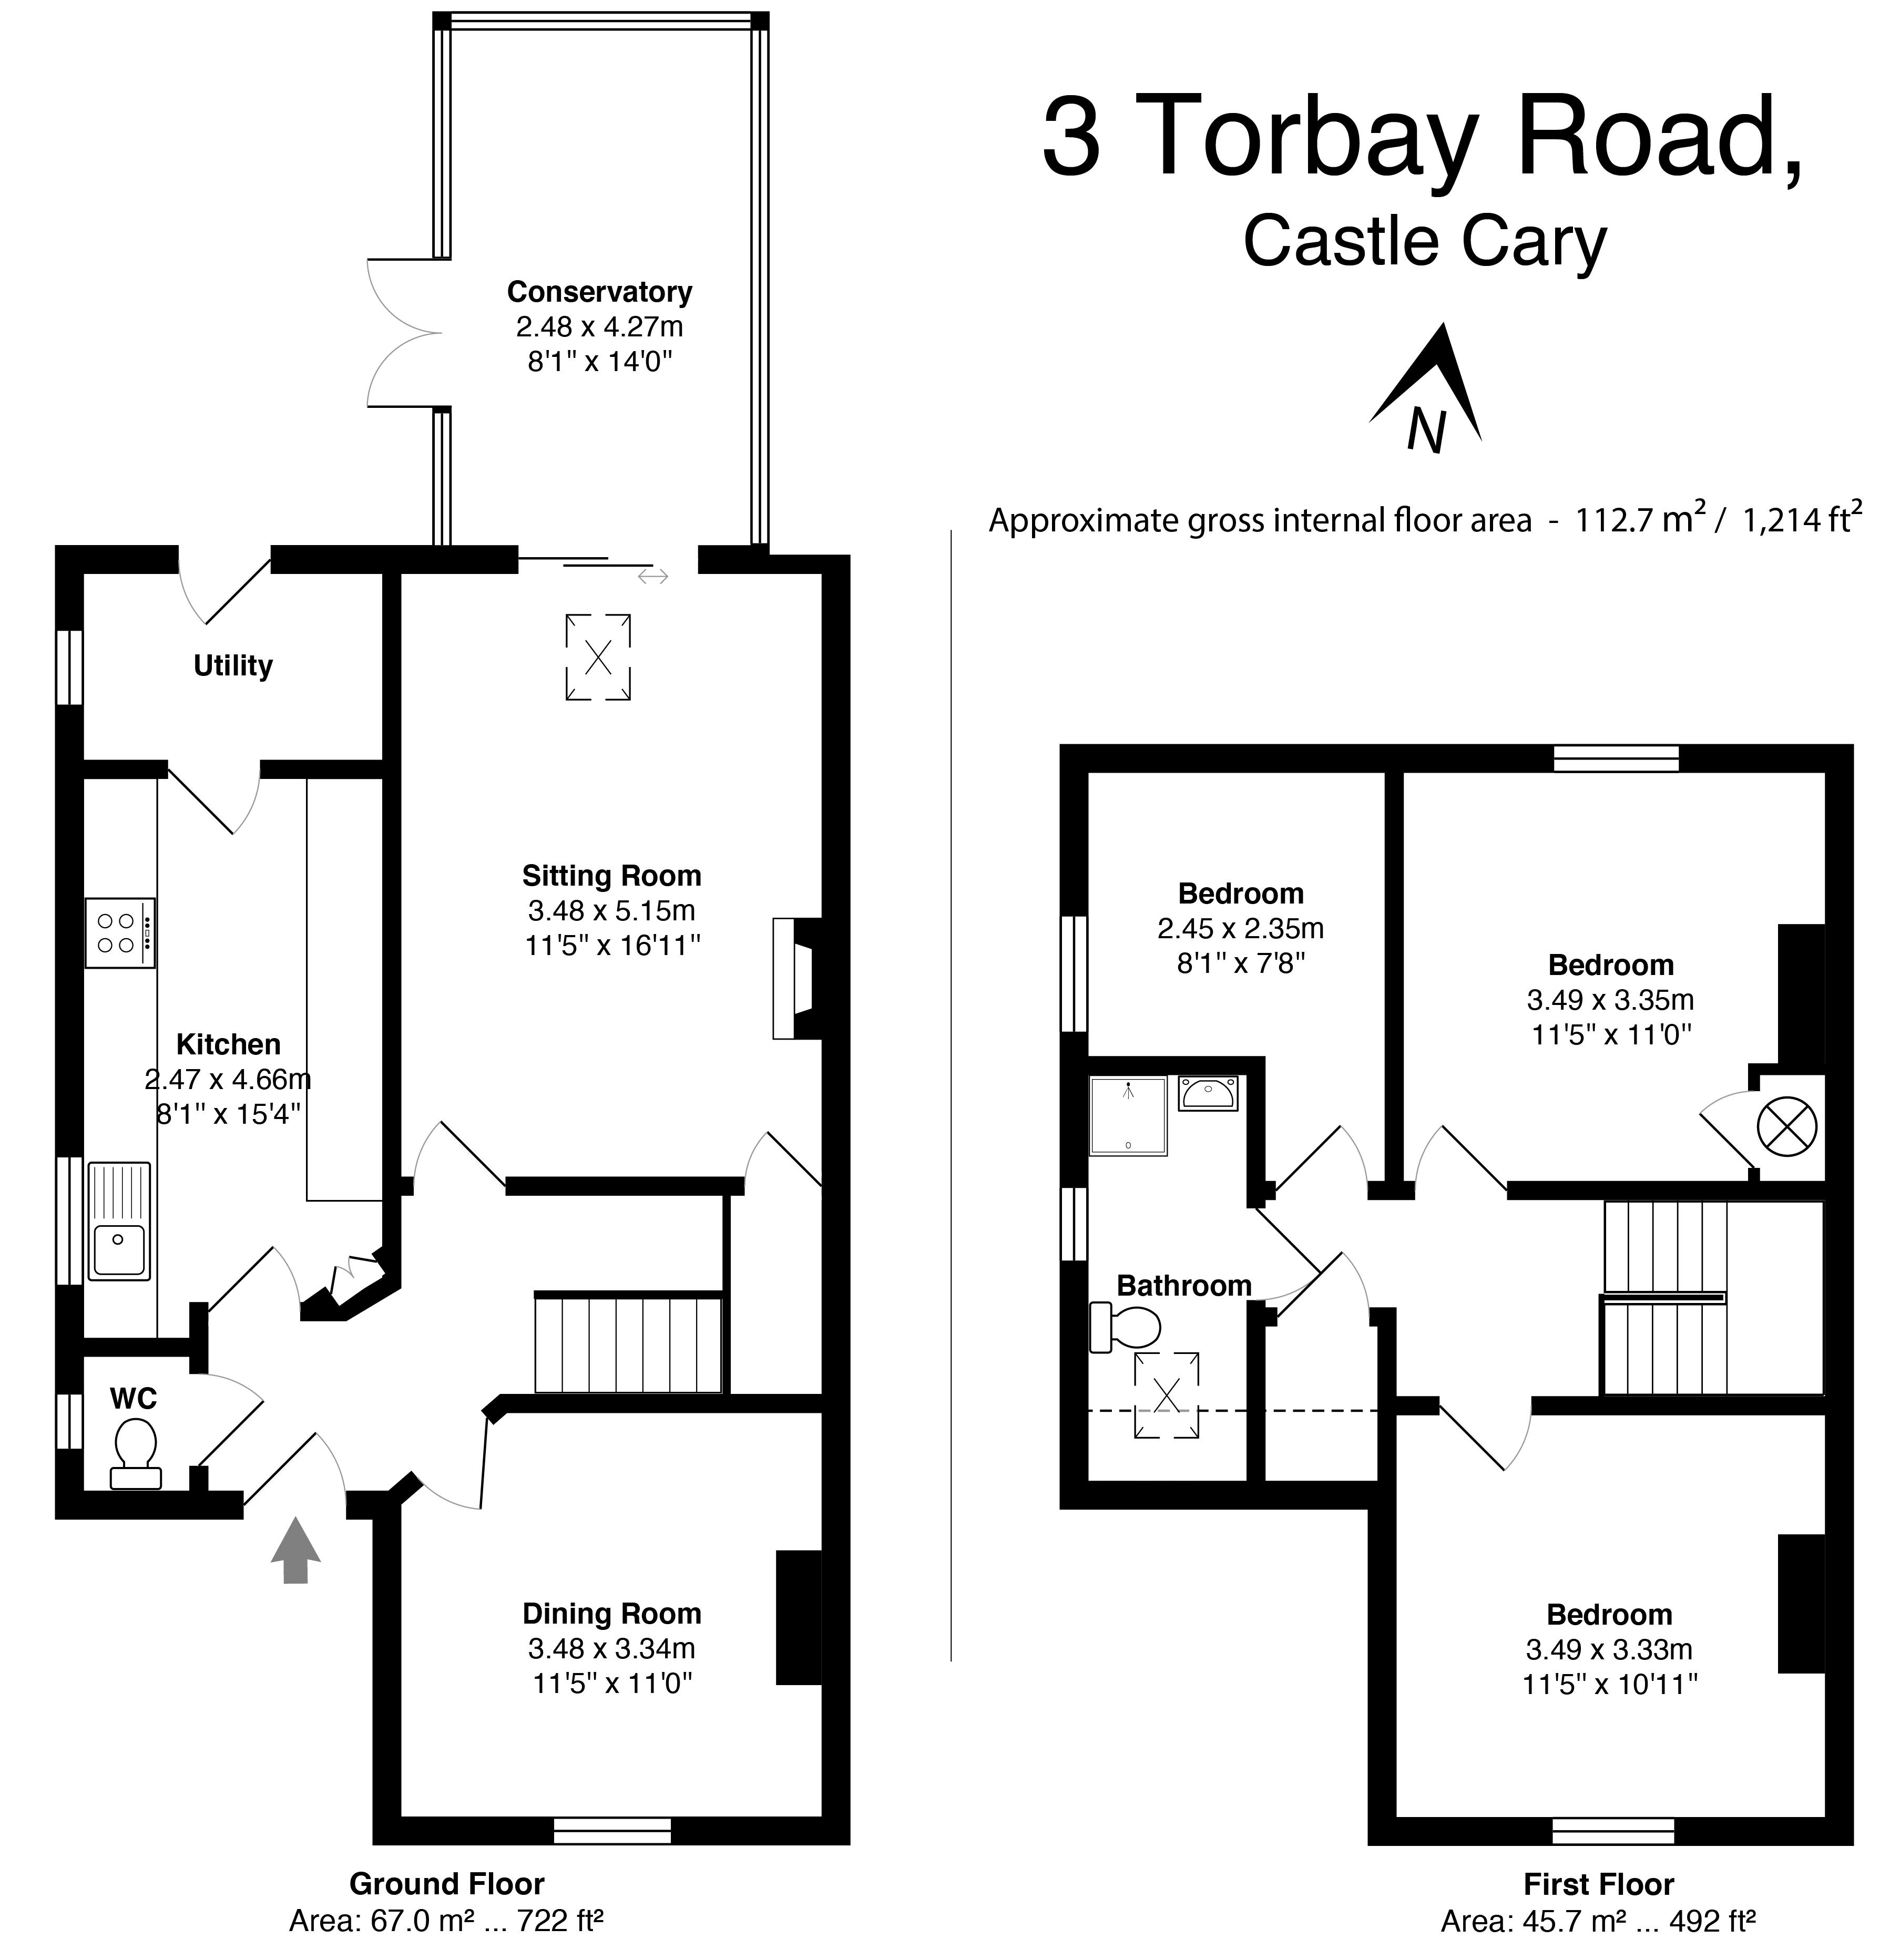 Torbay Road